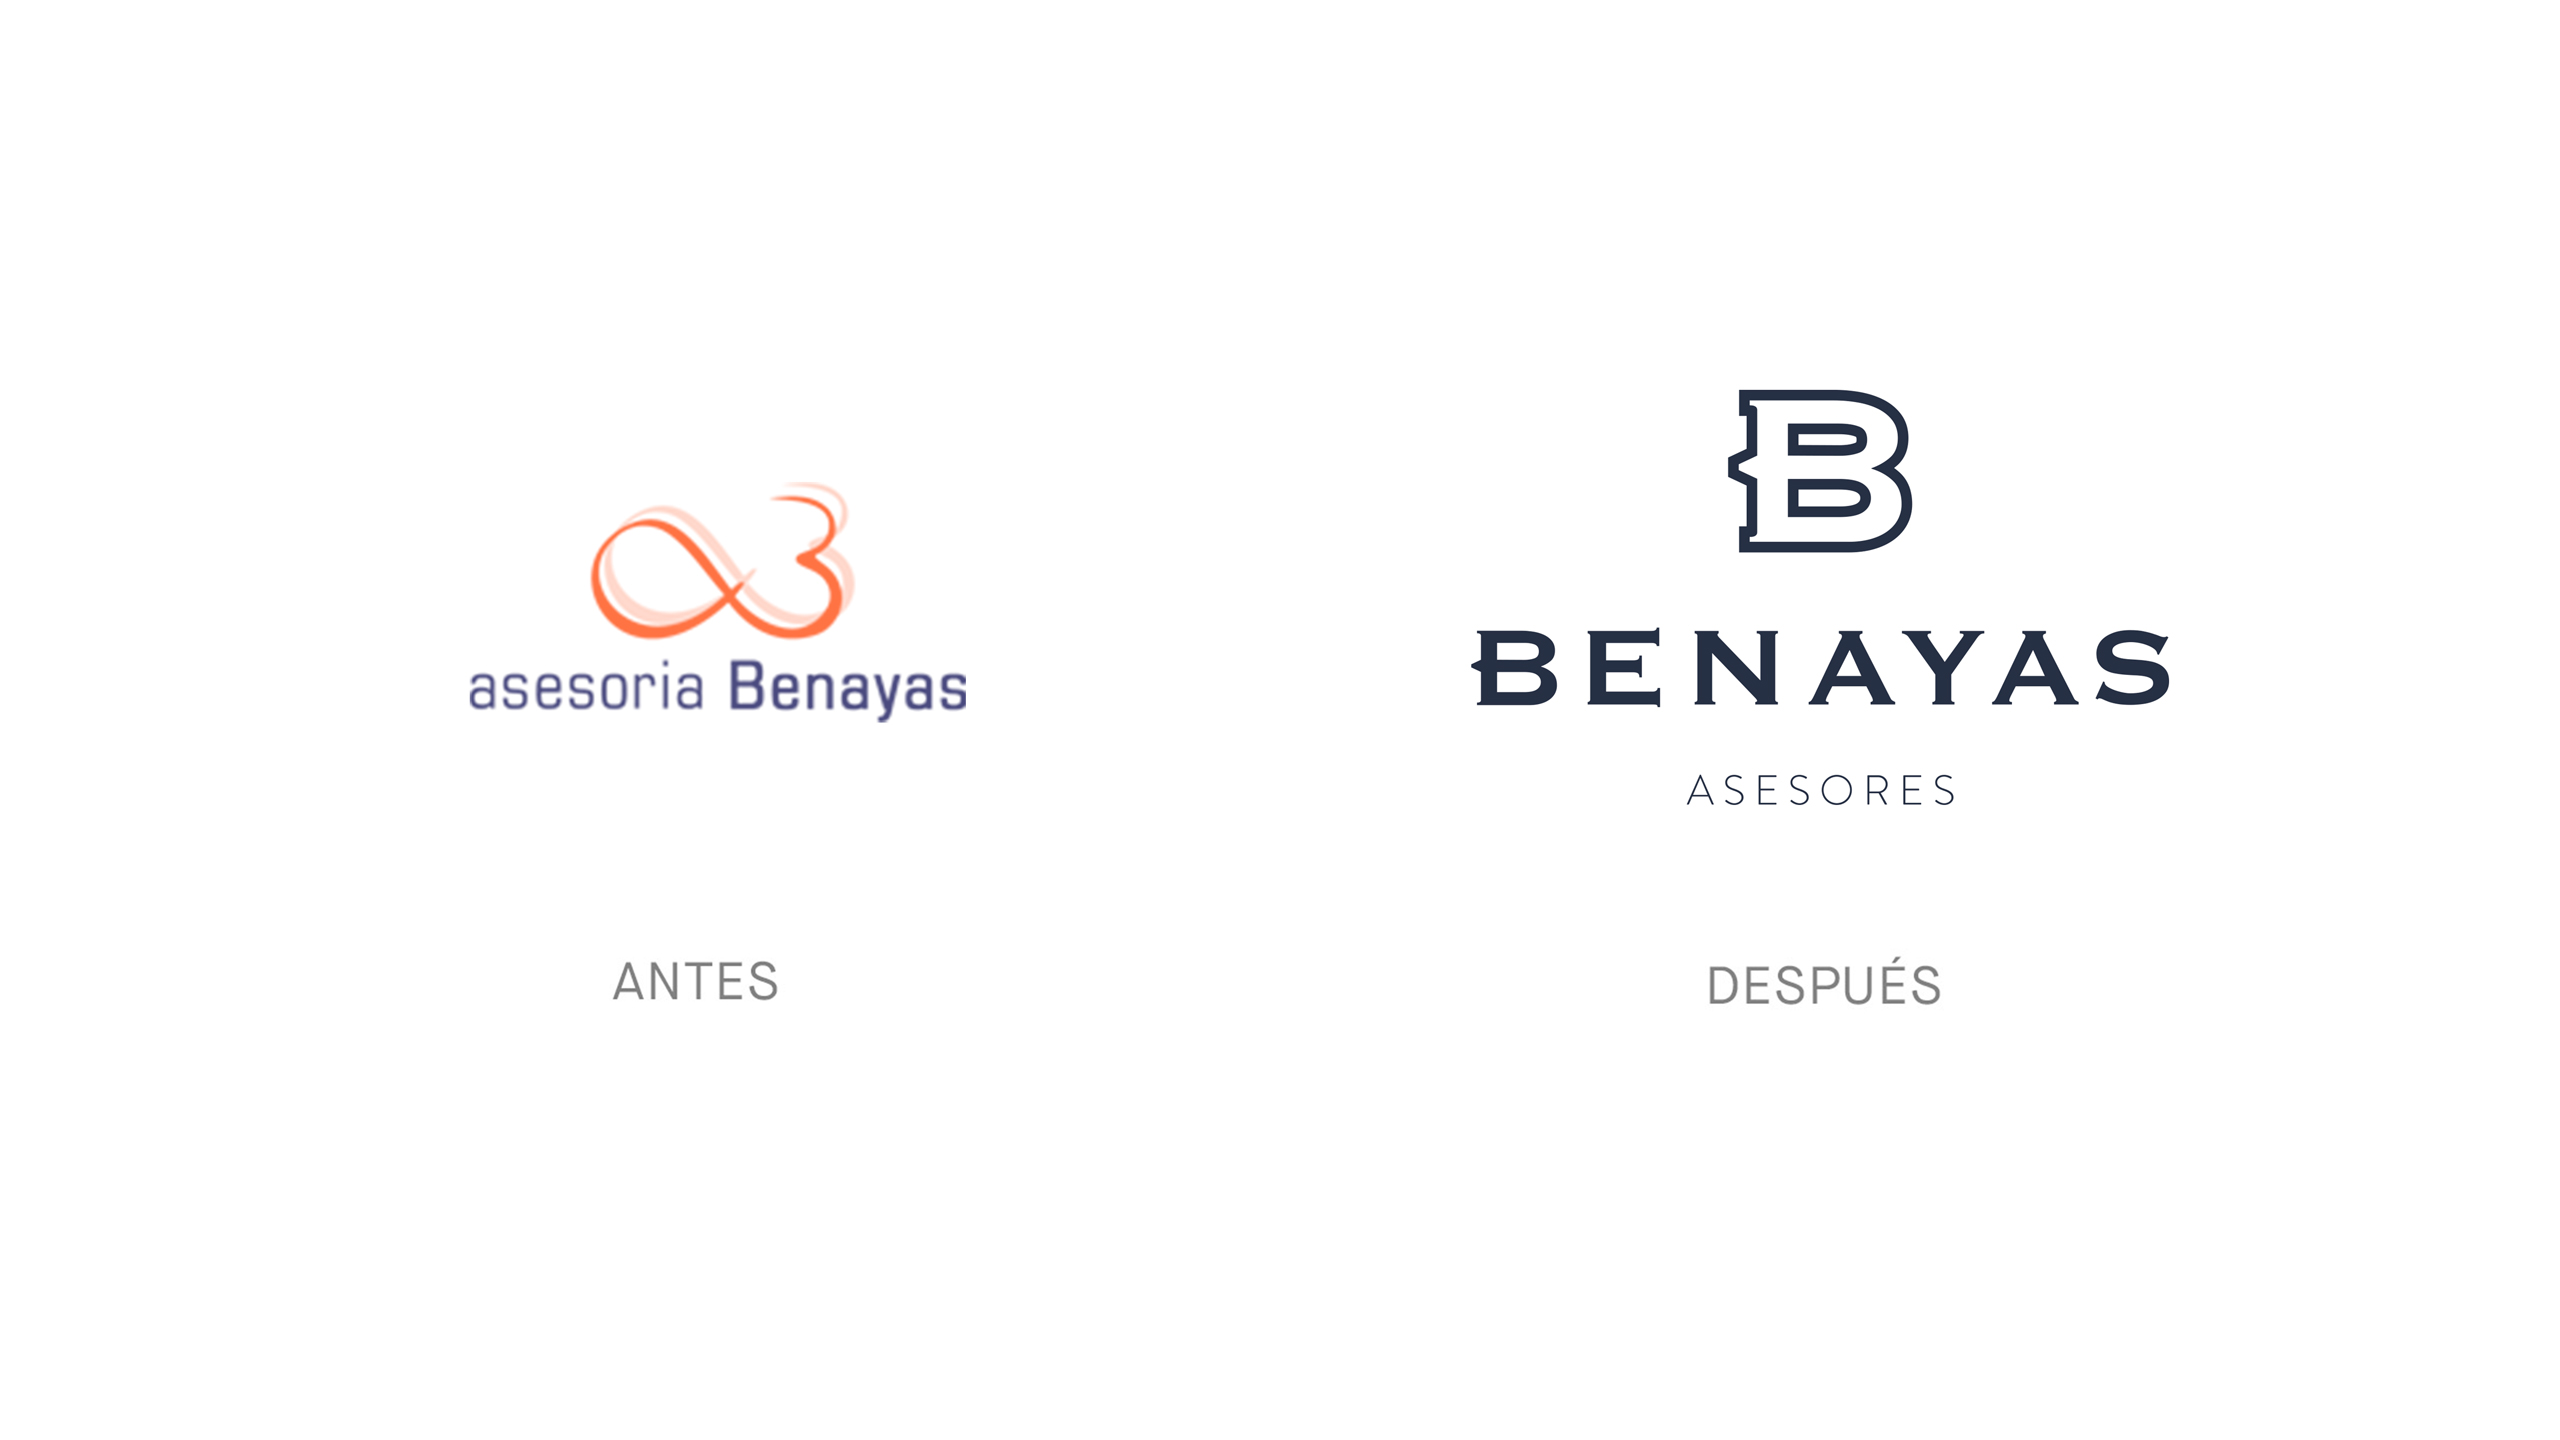 kamikaze_identidad-corporativa_rediseno_benayas-asesores_02